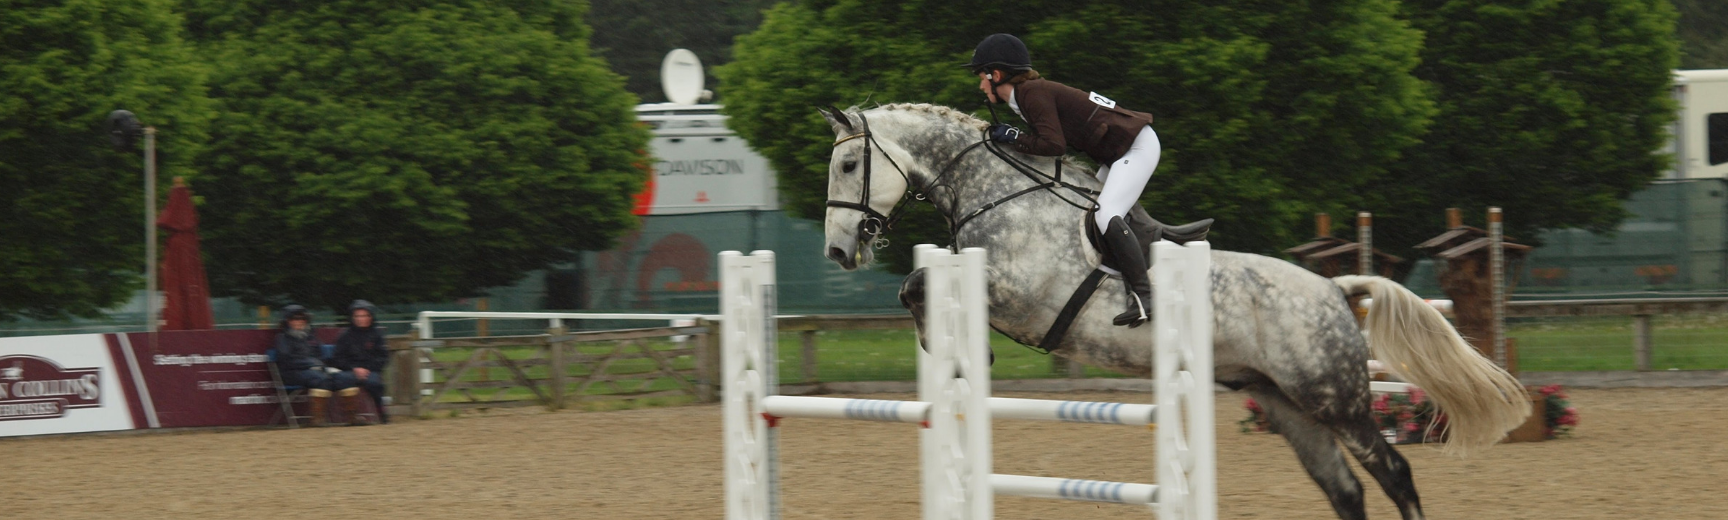 equestrian banner